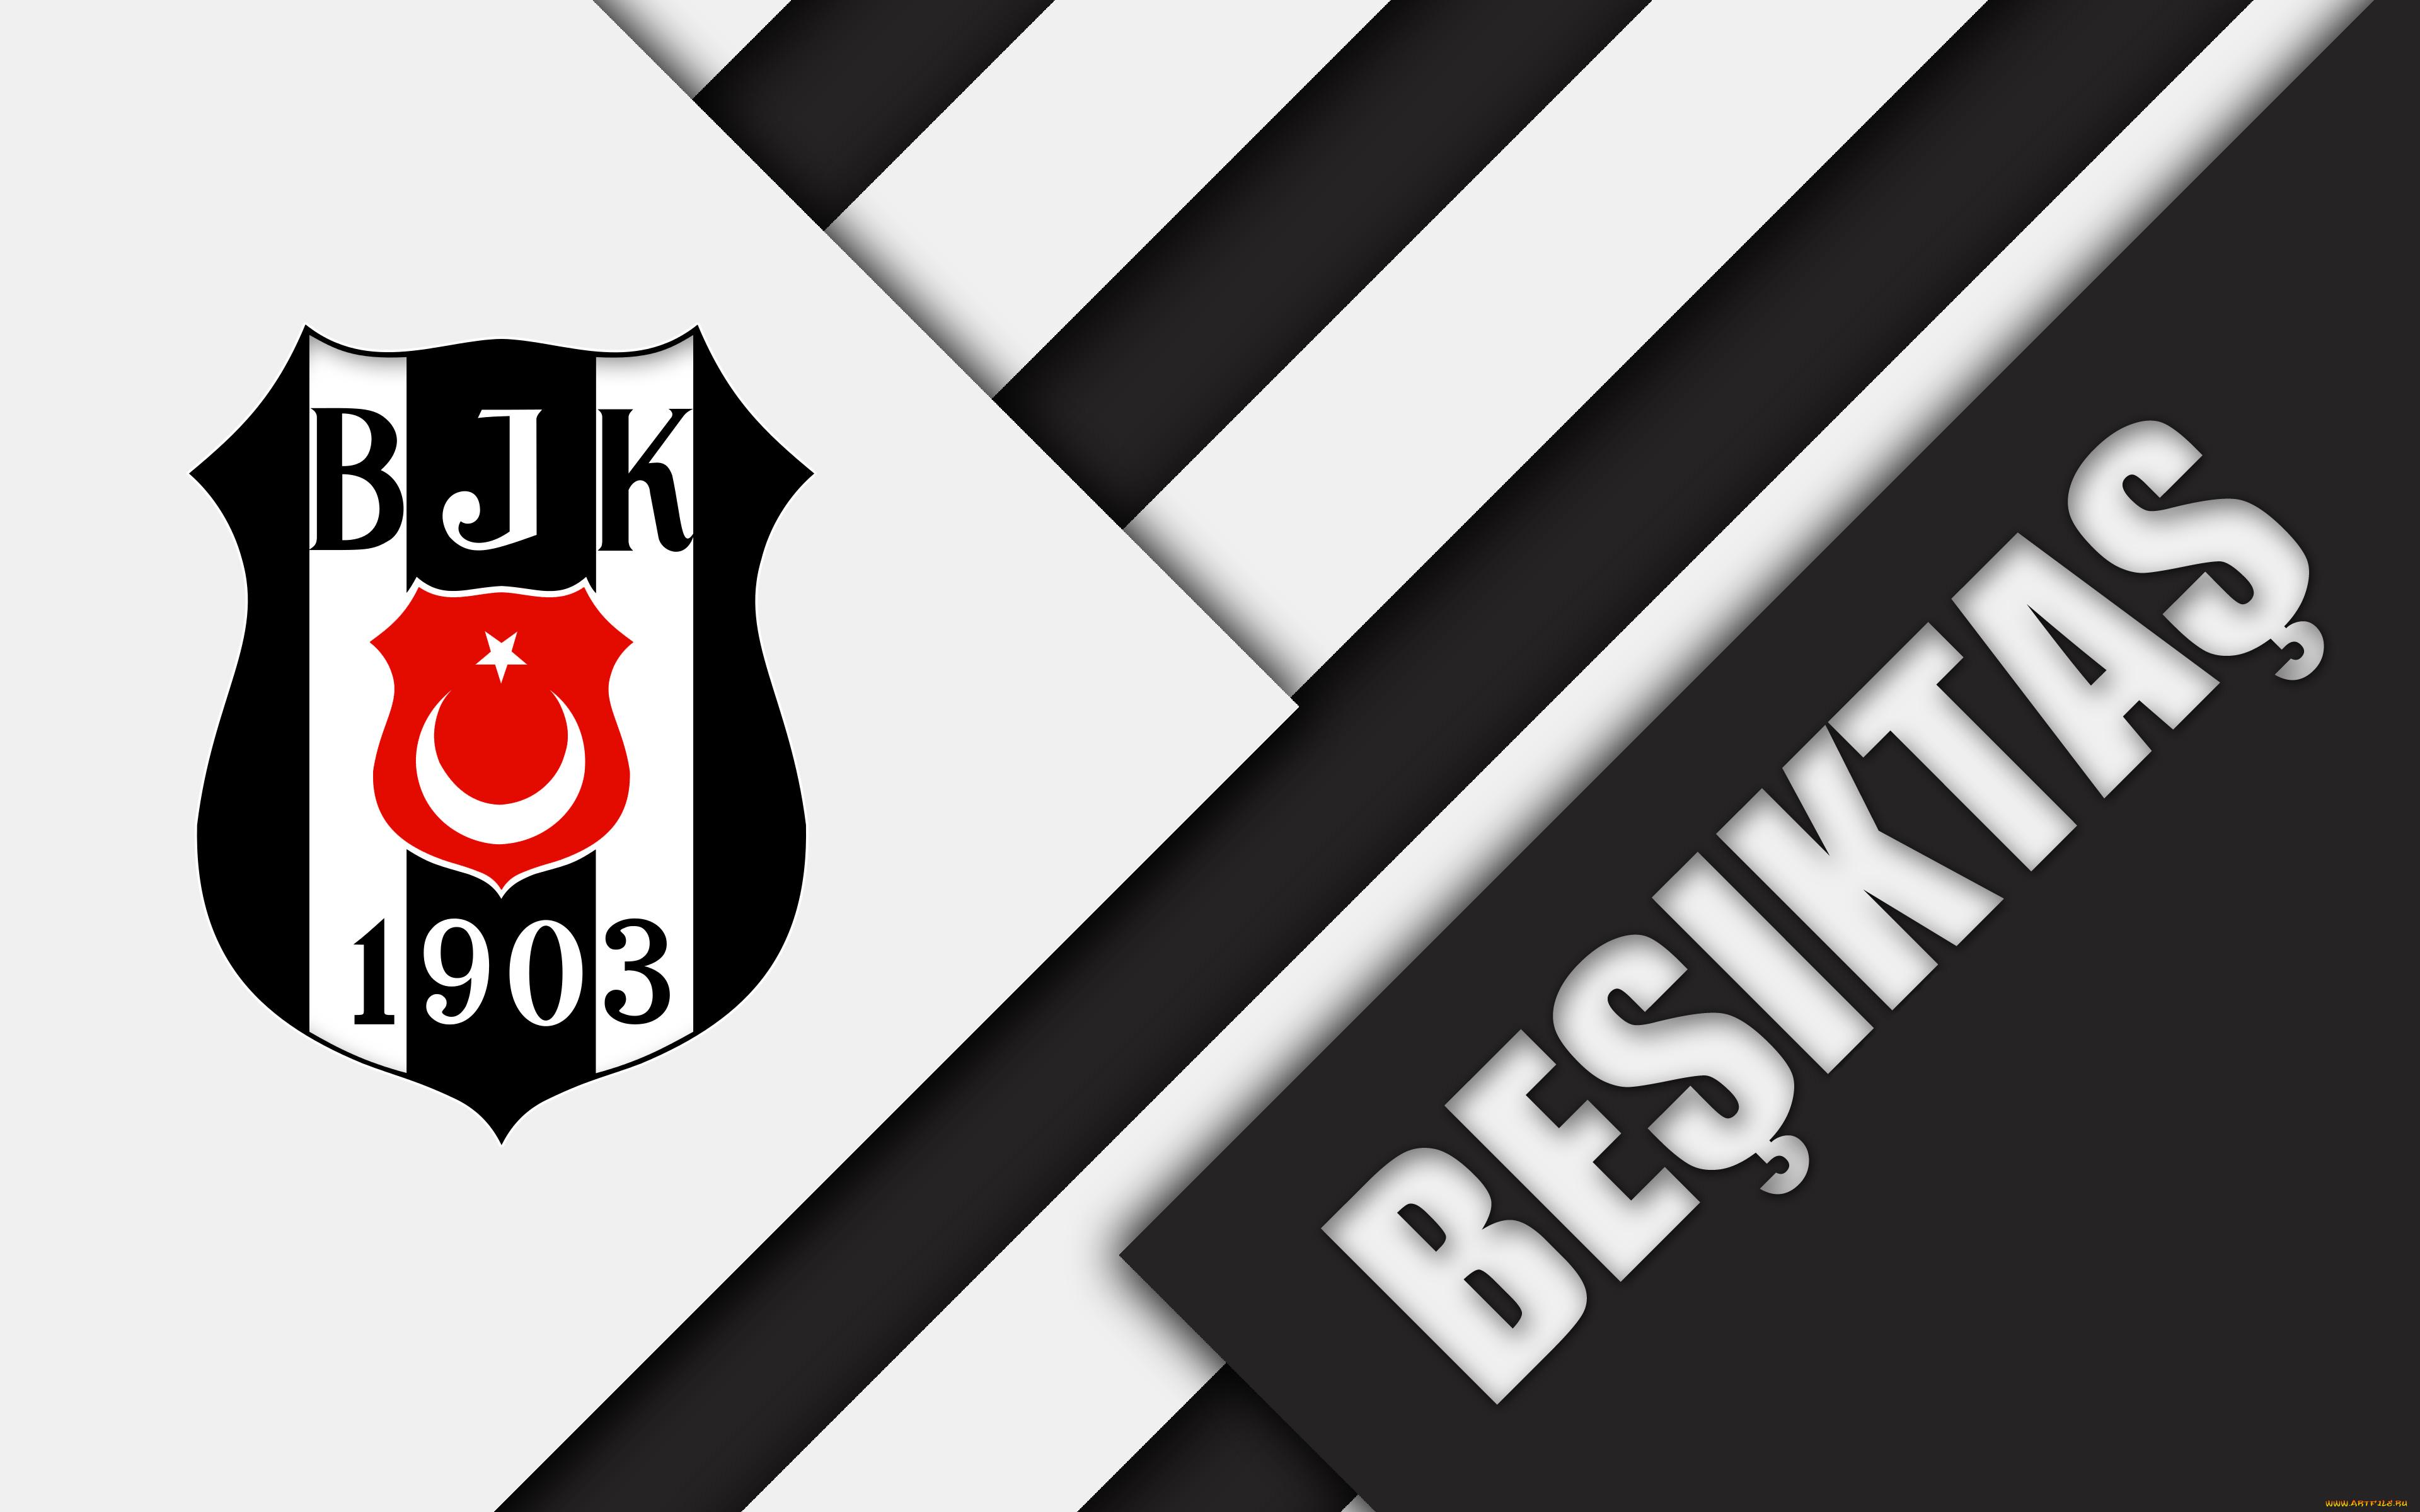 Beşiktaş 2k foto